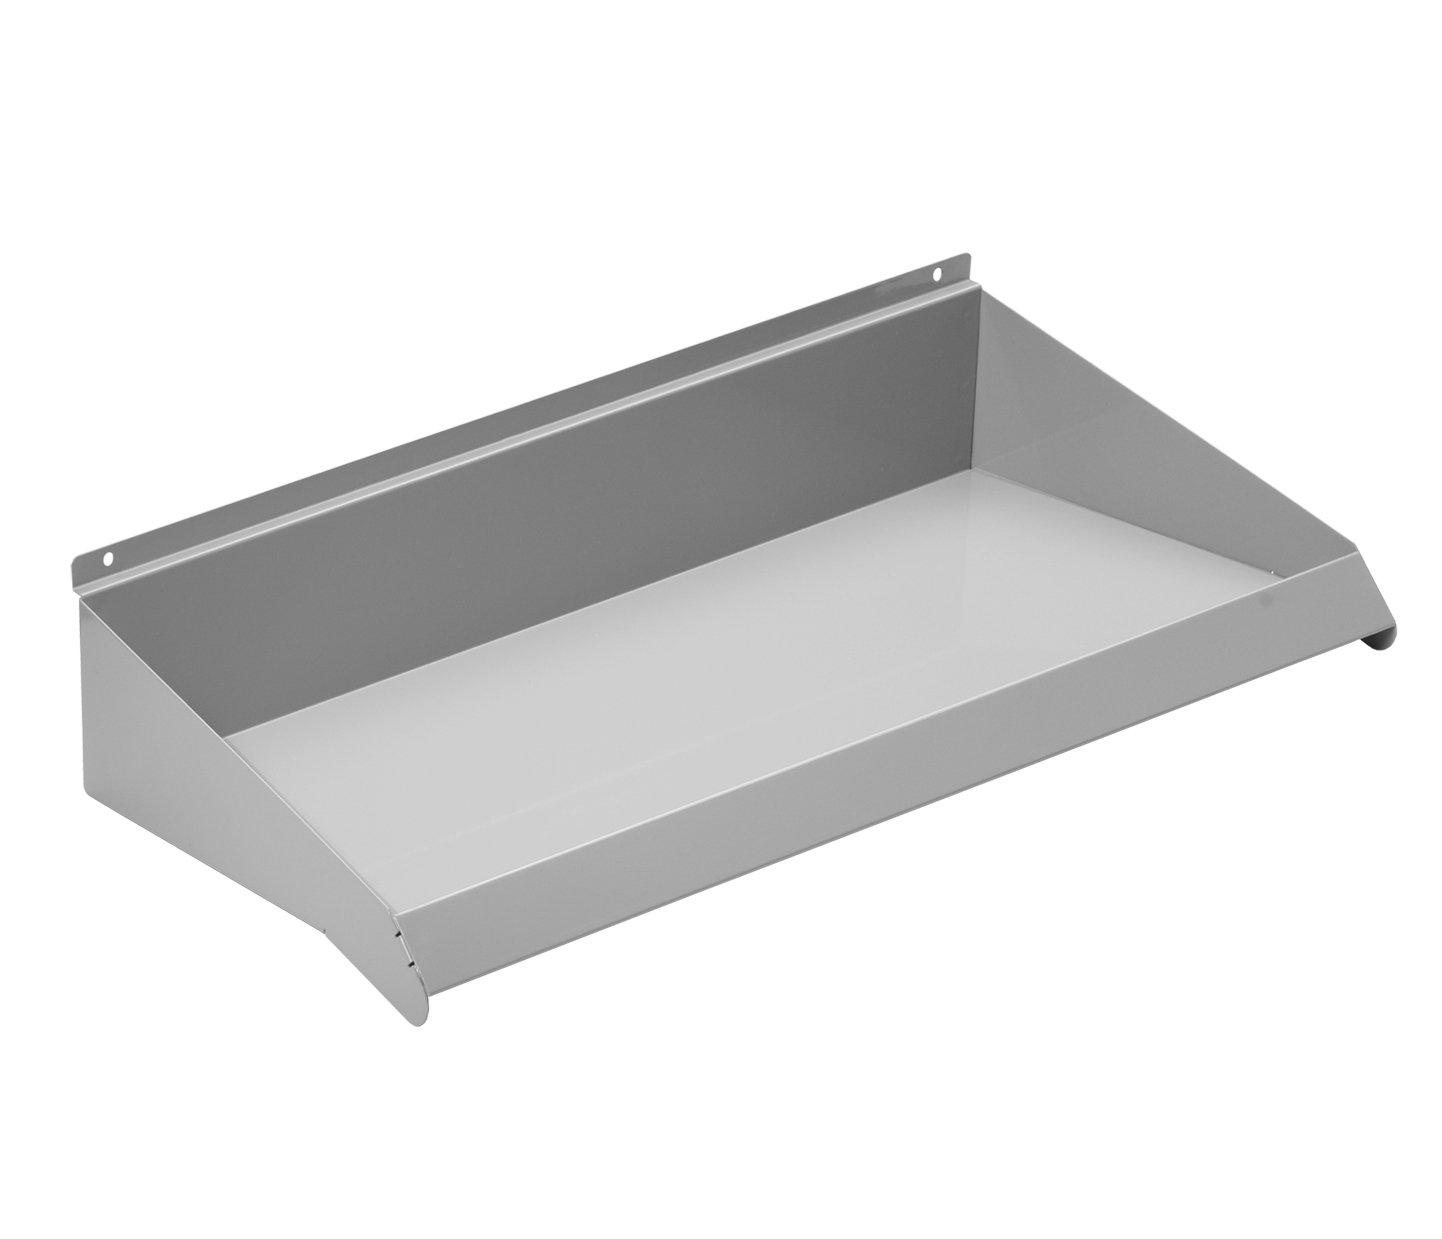 NeXtrac Slatwall Shelf for Merchandising, 24'' x 10'', Grey